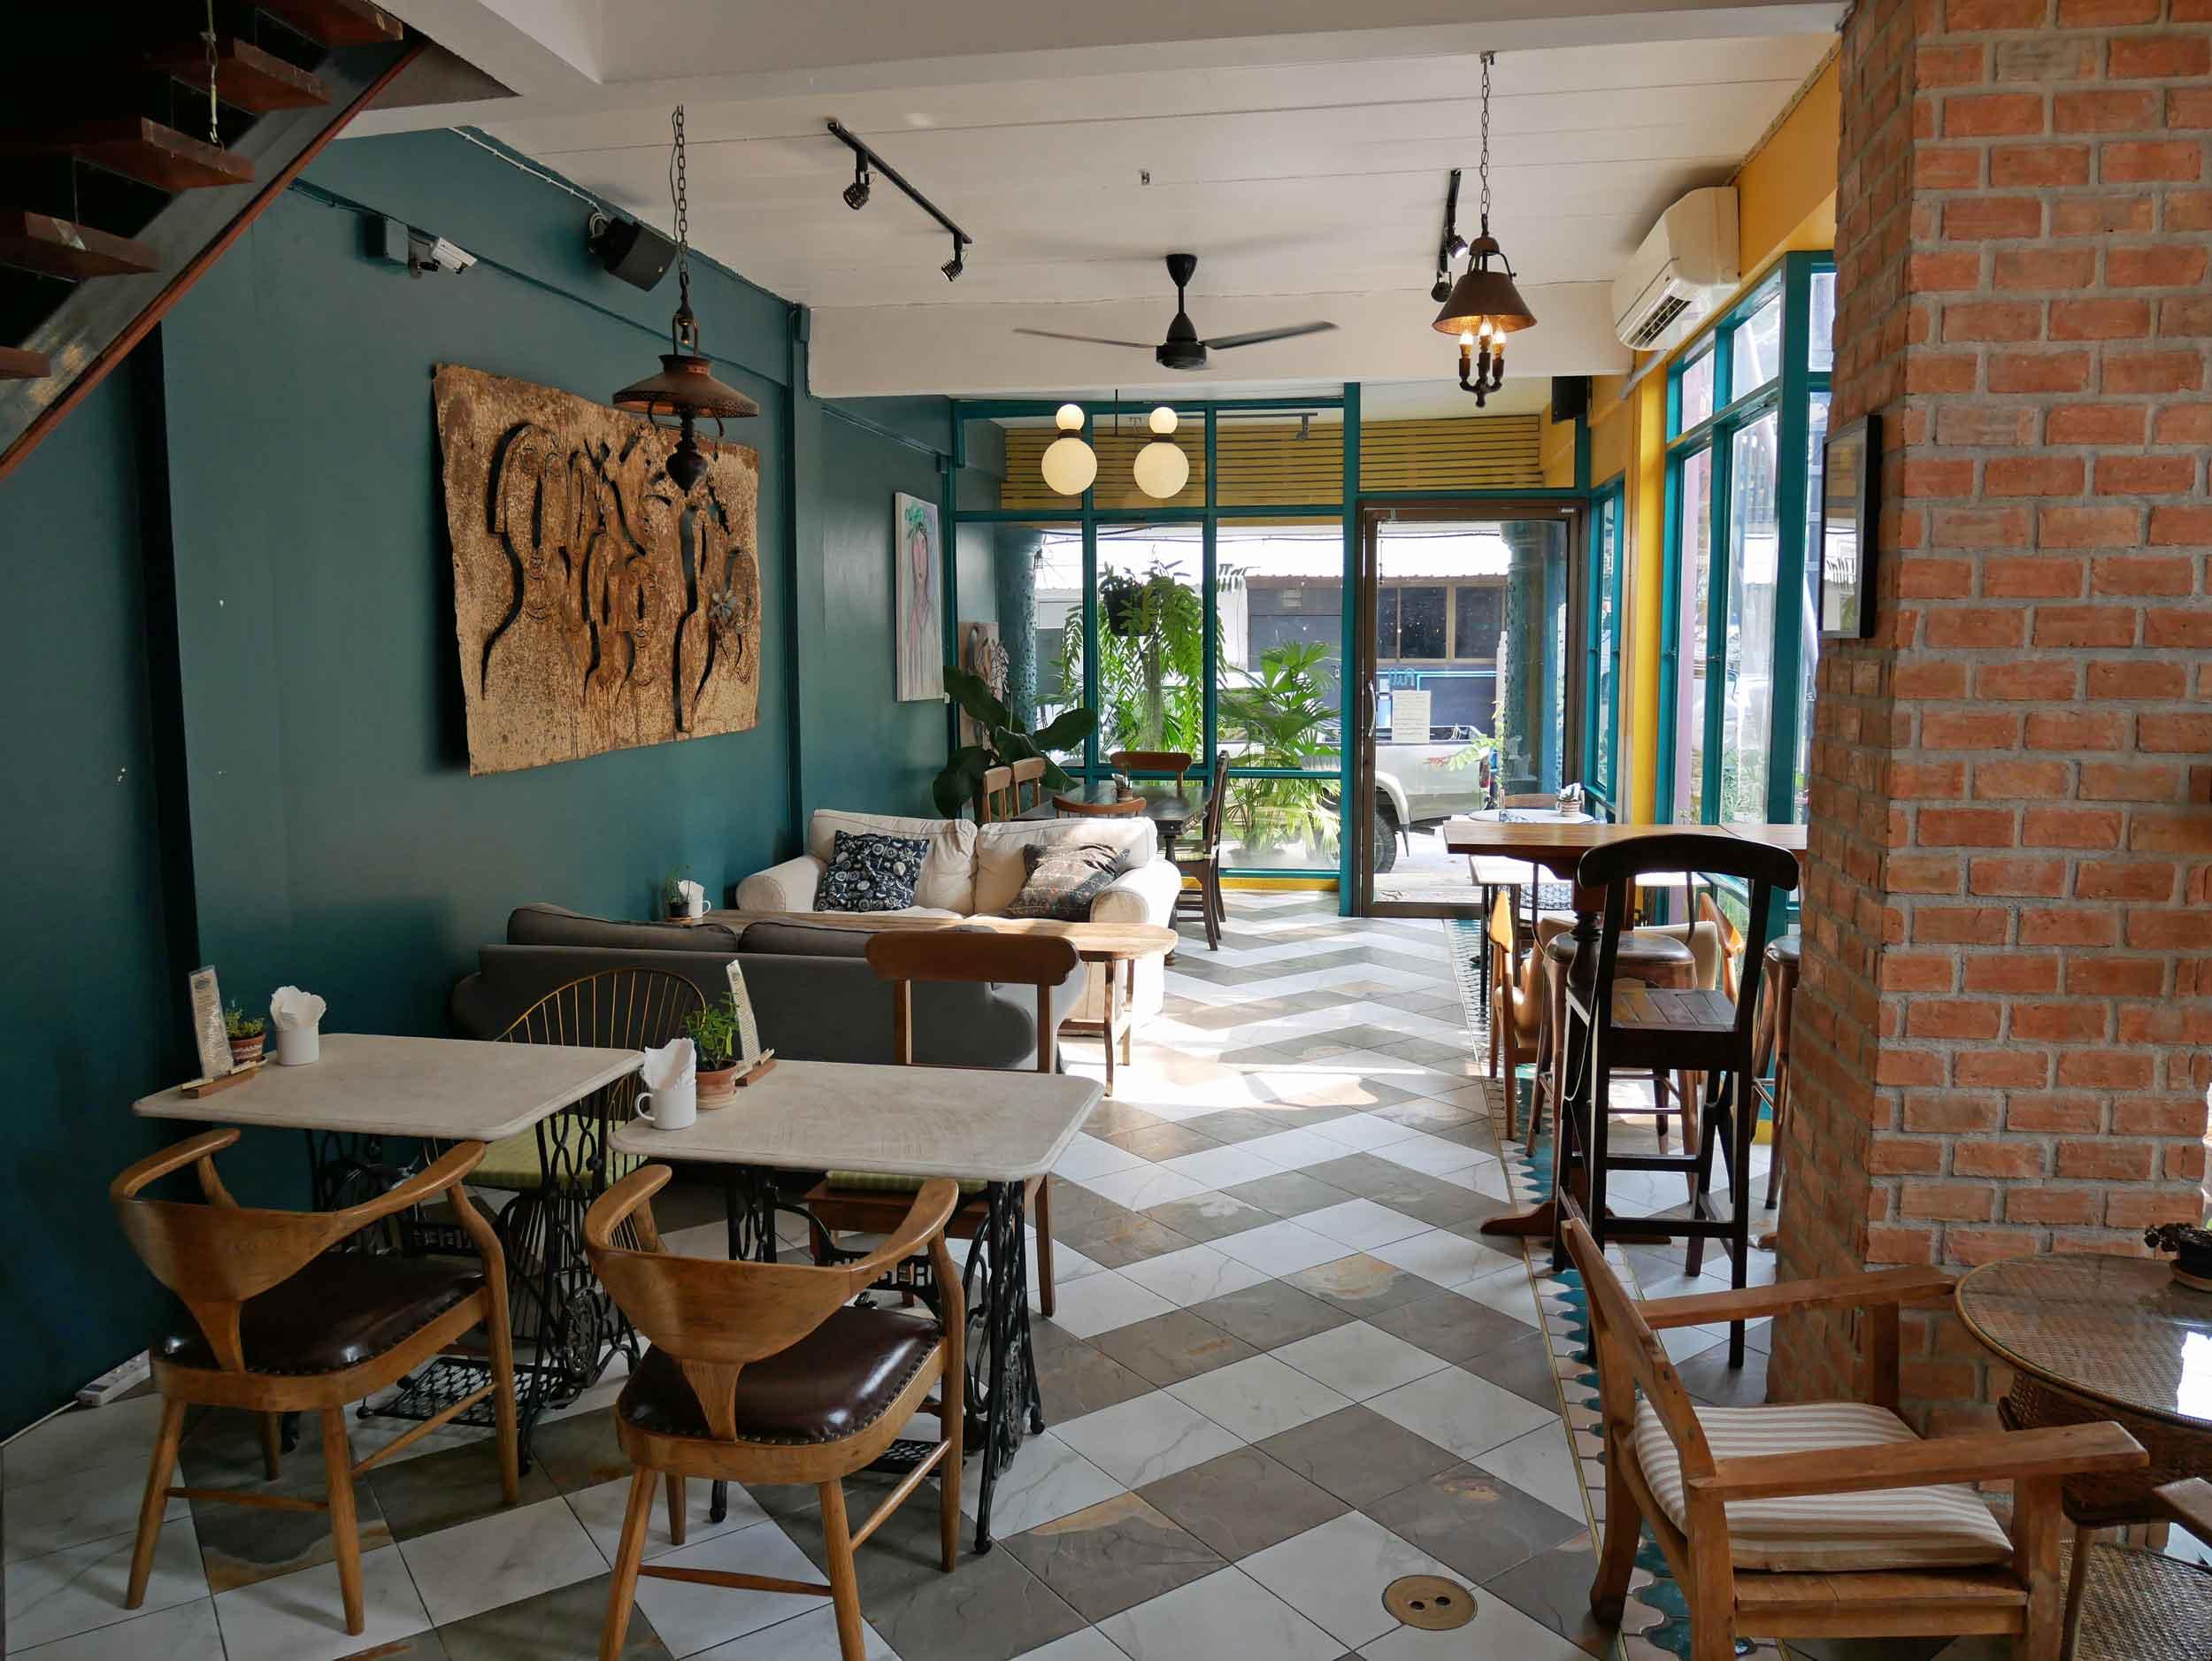 My Secret Cafe is a beautiful, cozy spot to enjoy a light breakfast or iced coffee.